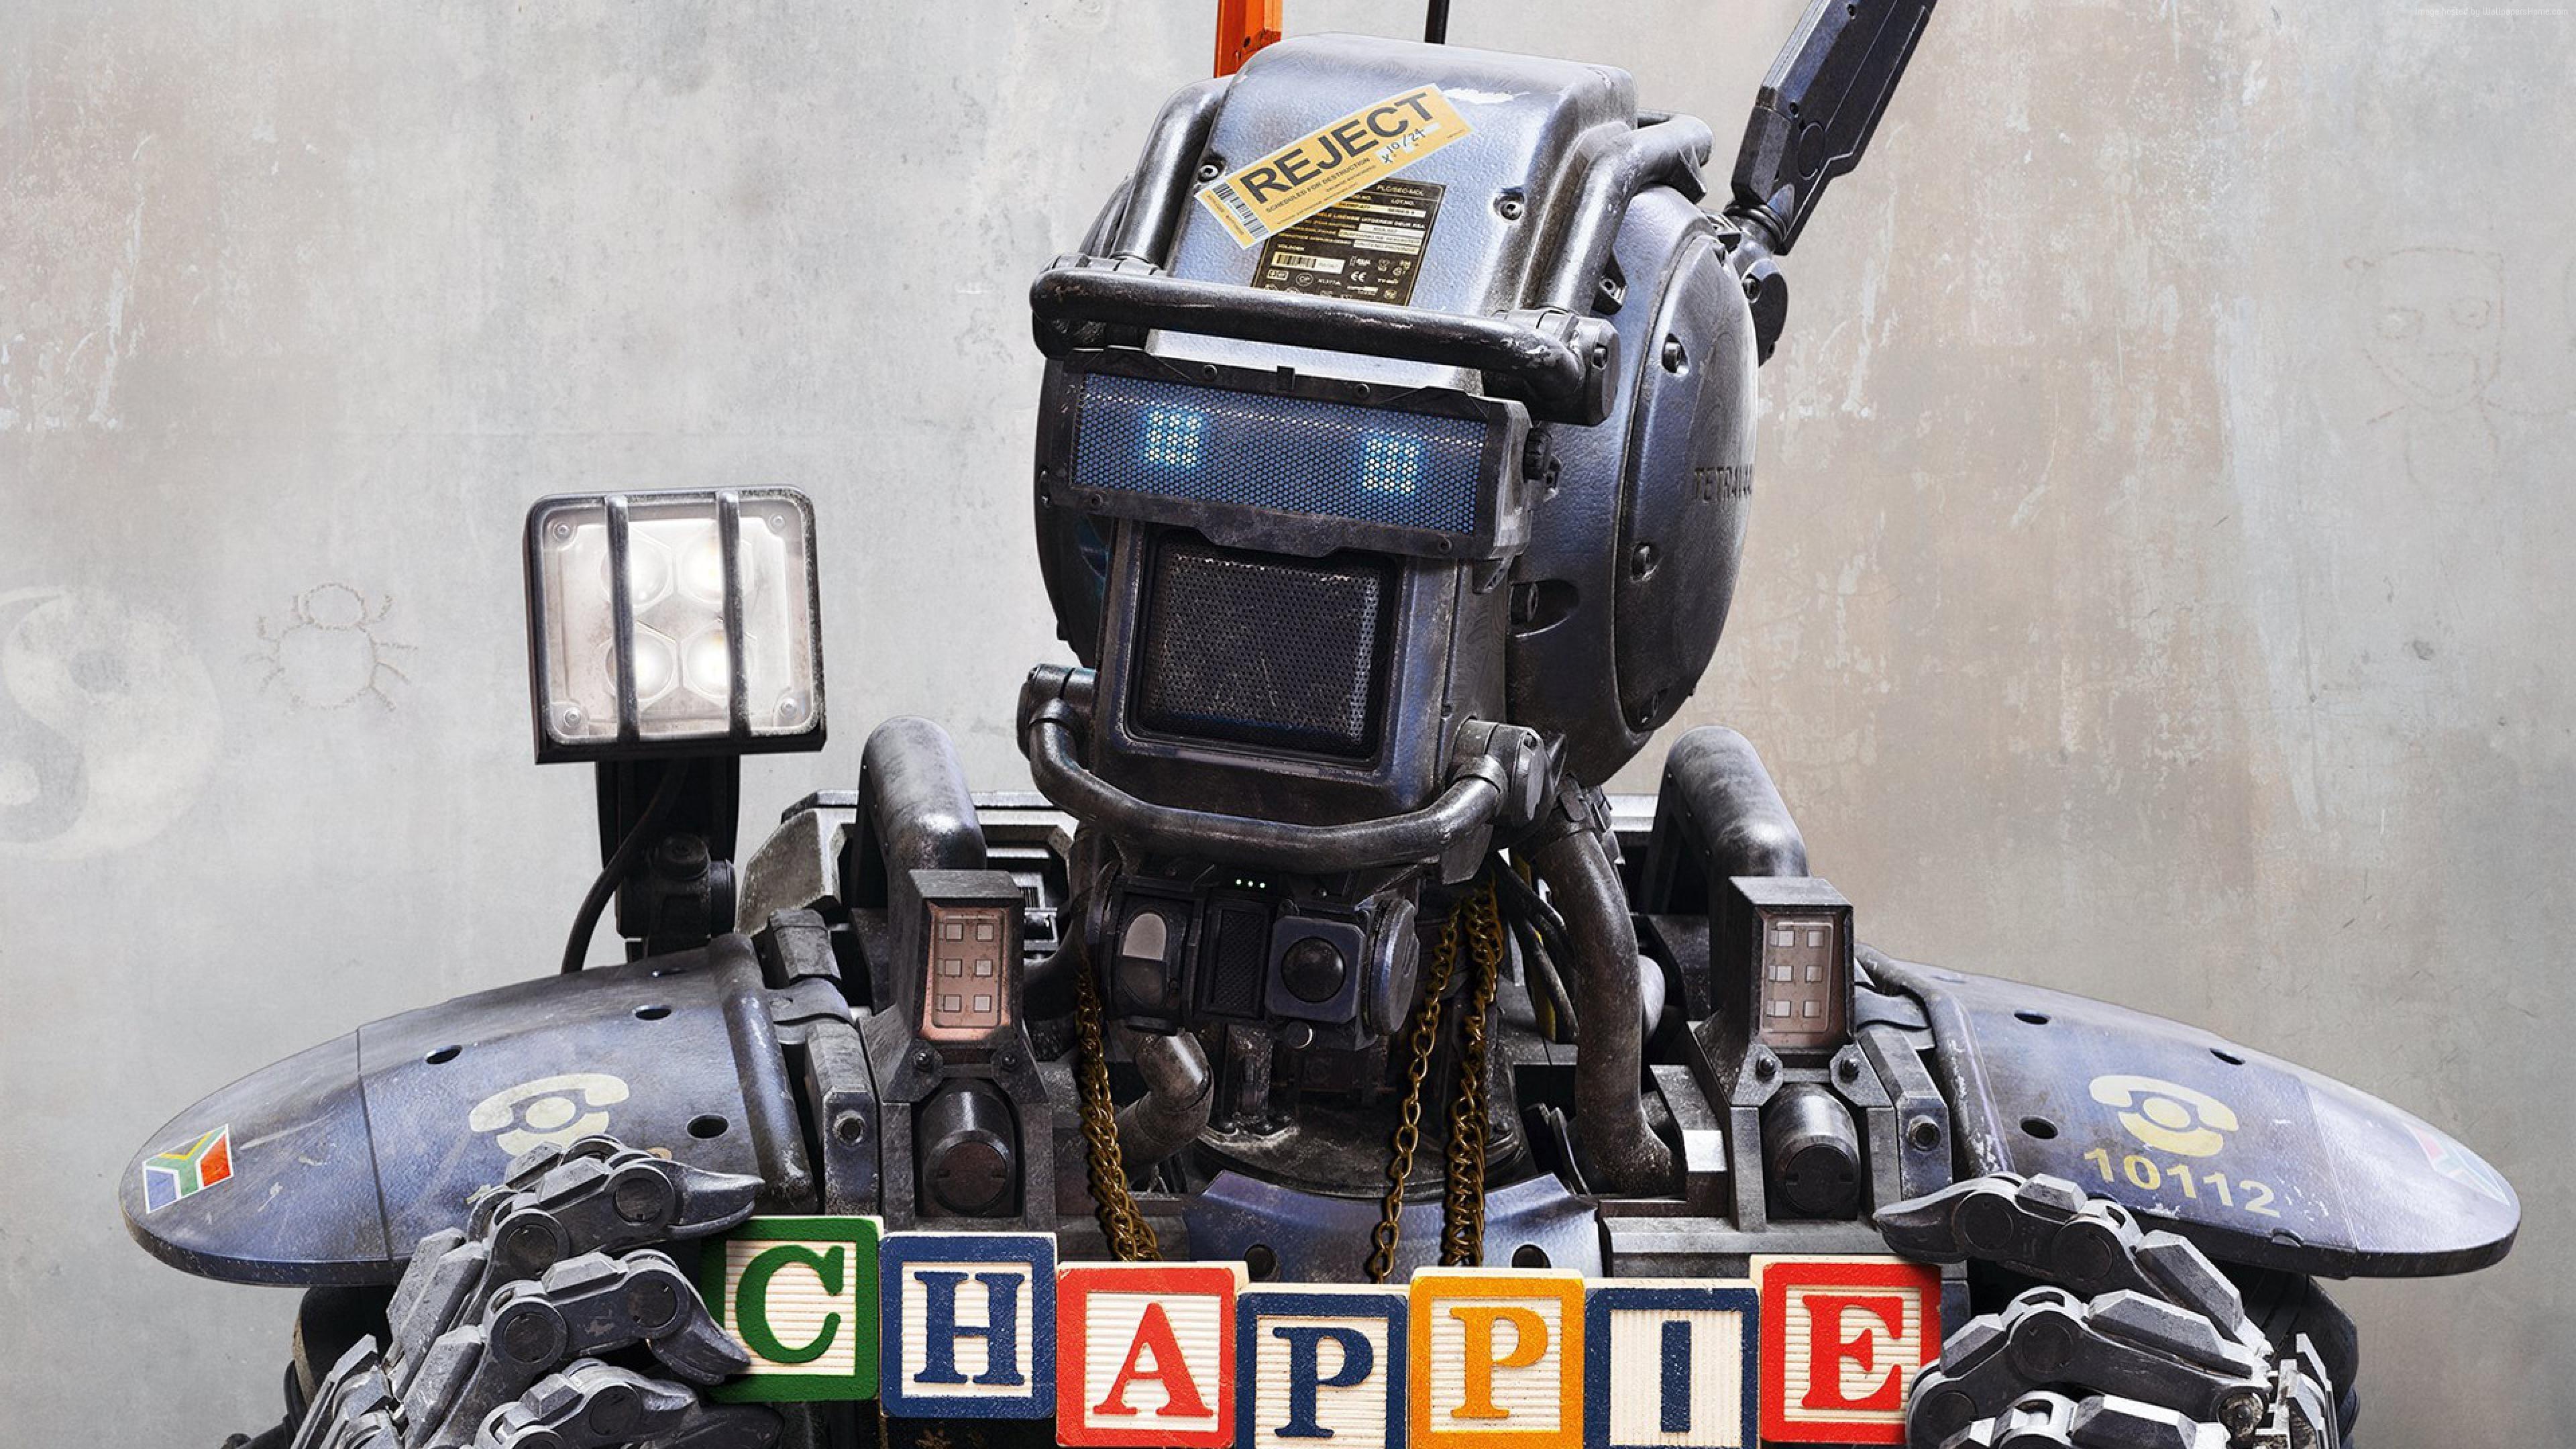 Chappie, Best Movies of 2015, robot, police, wallpaper, gun (horizontal …